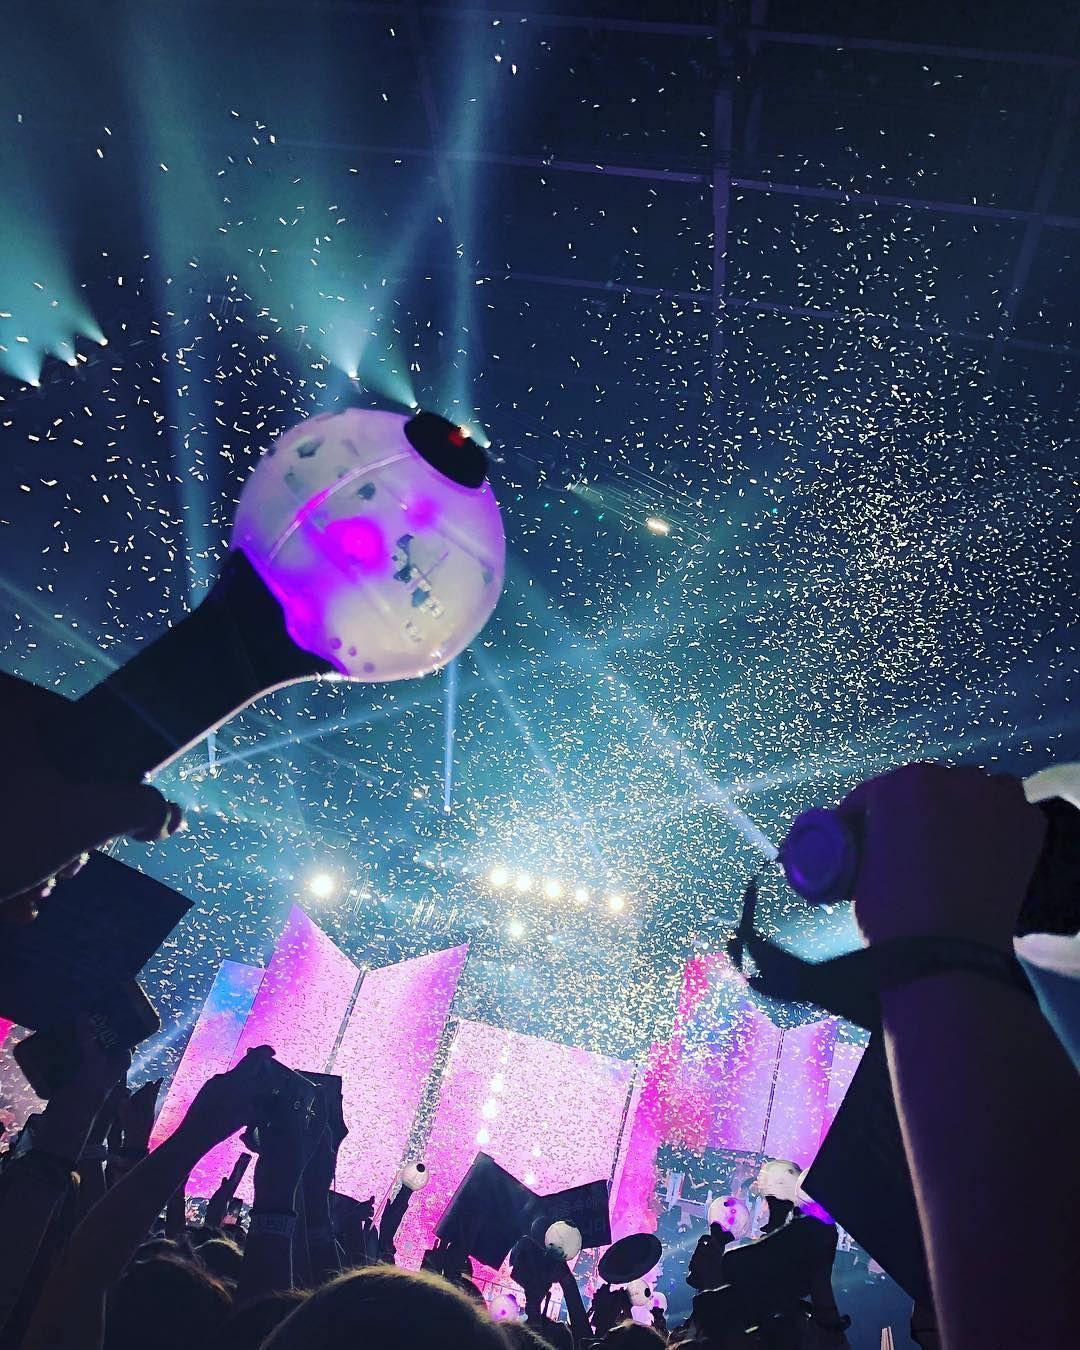 army-concert-bomb